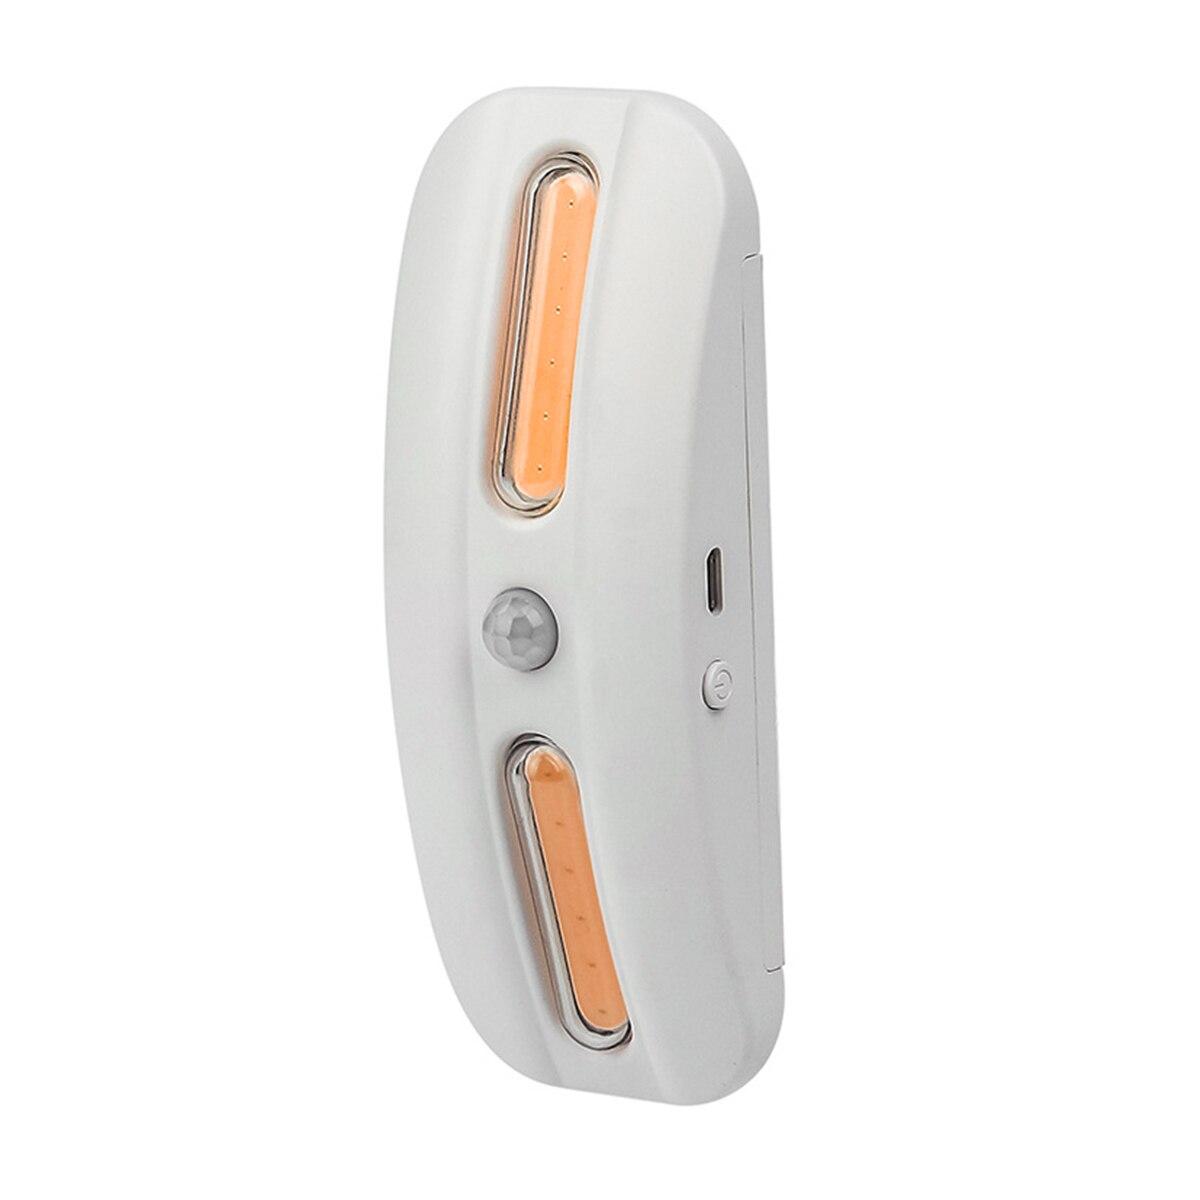 Motion Activated LED Night Light UV Sterilizing Light USB Rechargeable Motion Sensor Light For Toilet Cabinet Sterilization Tool